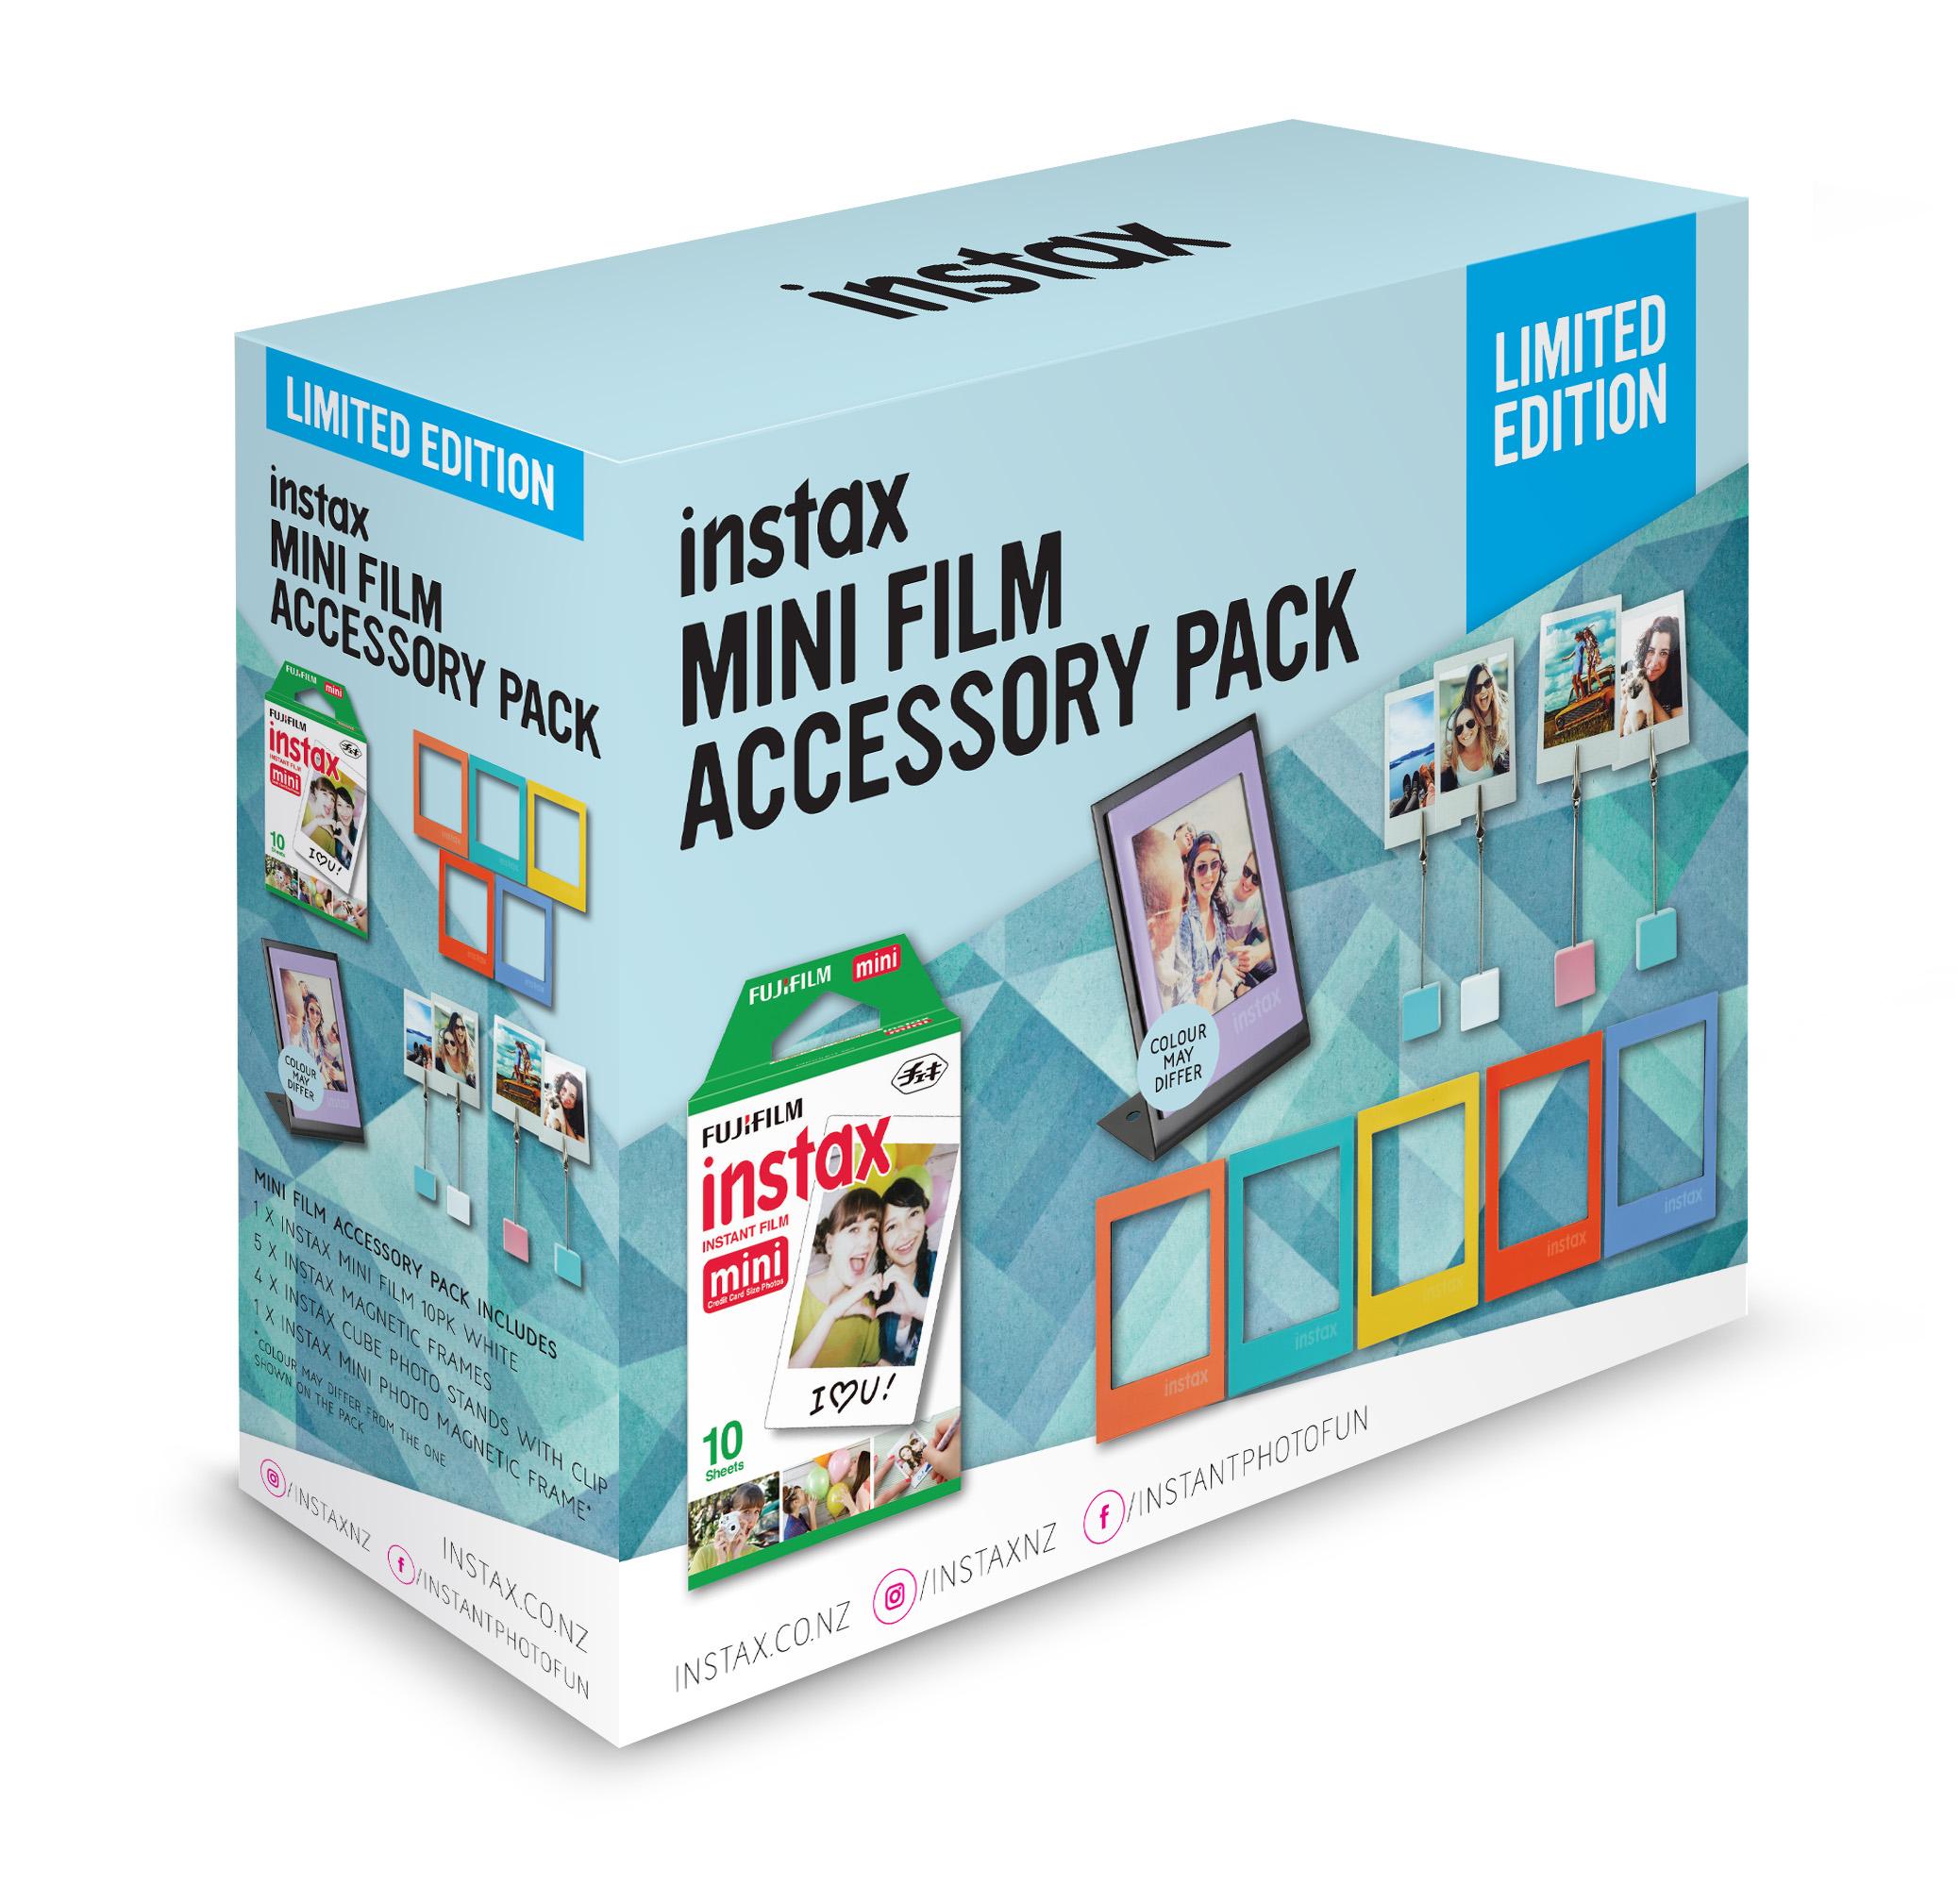 instax-mini-film-accessory-pack-mock-up